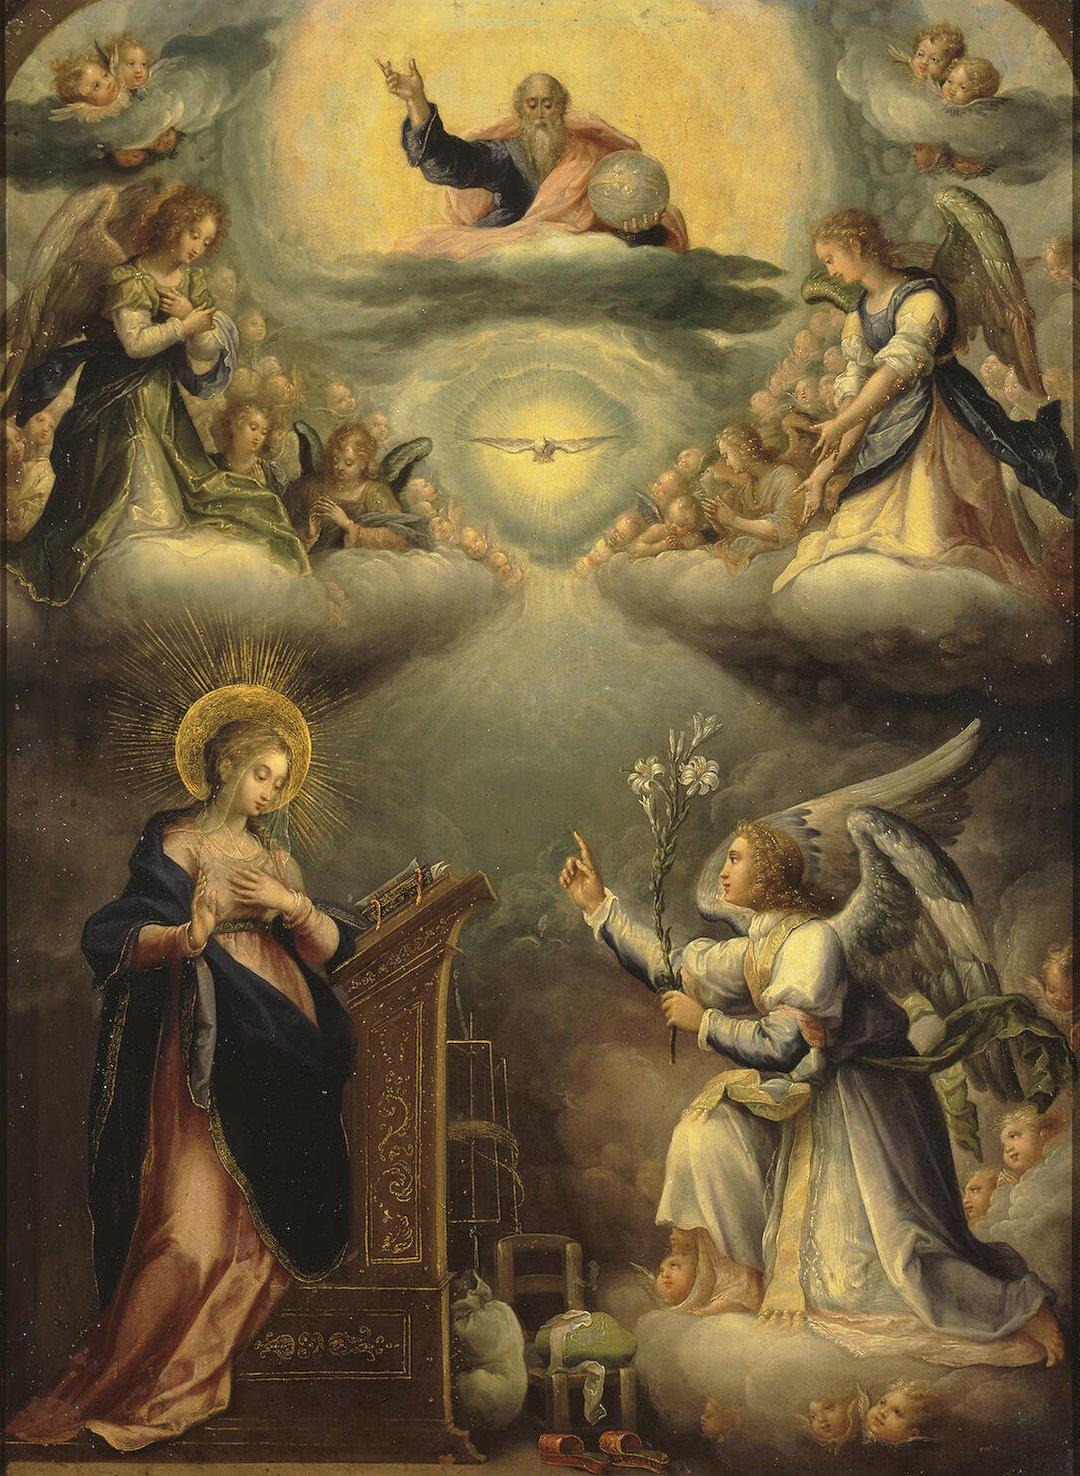 St. Gabriel 4